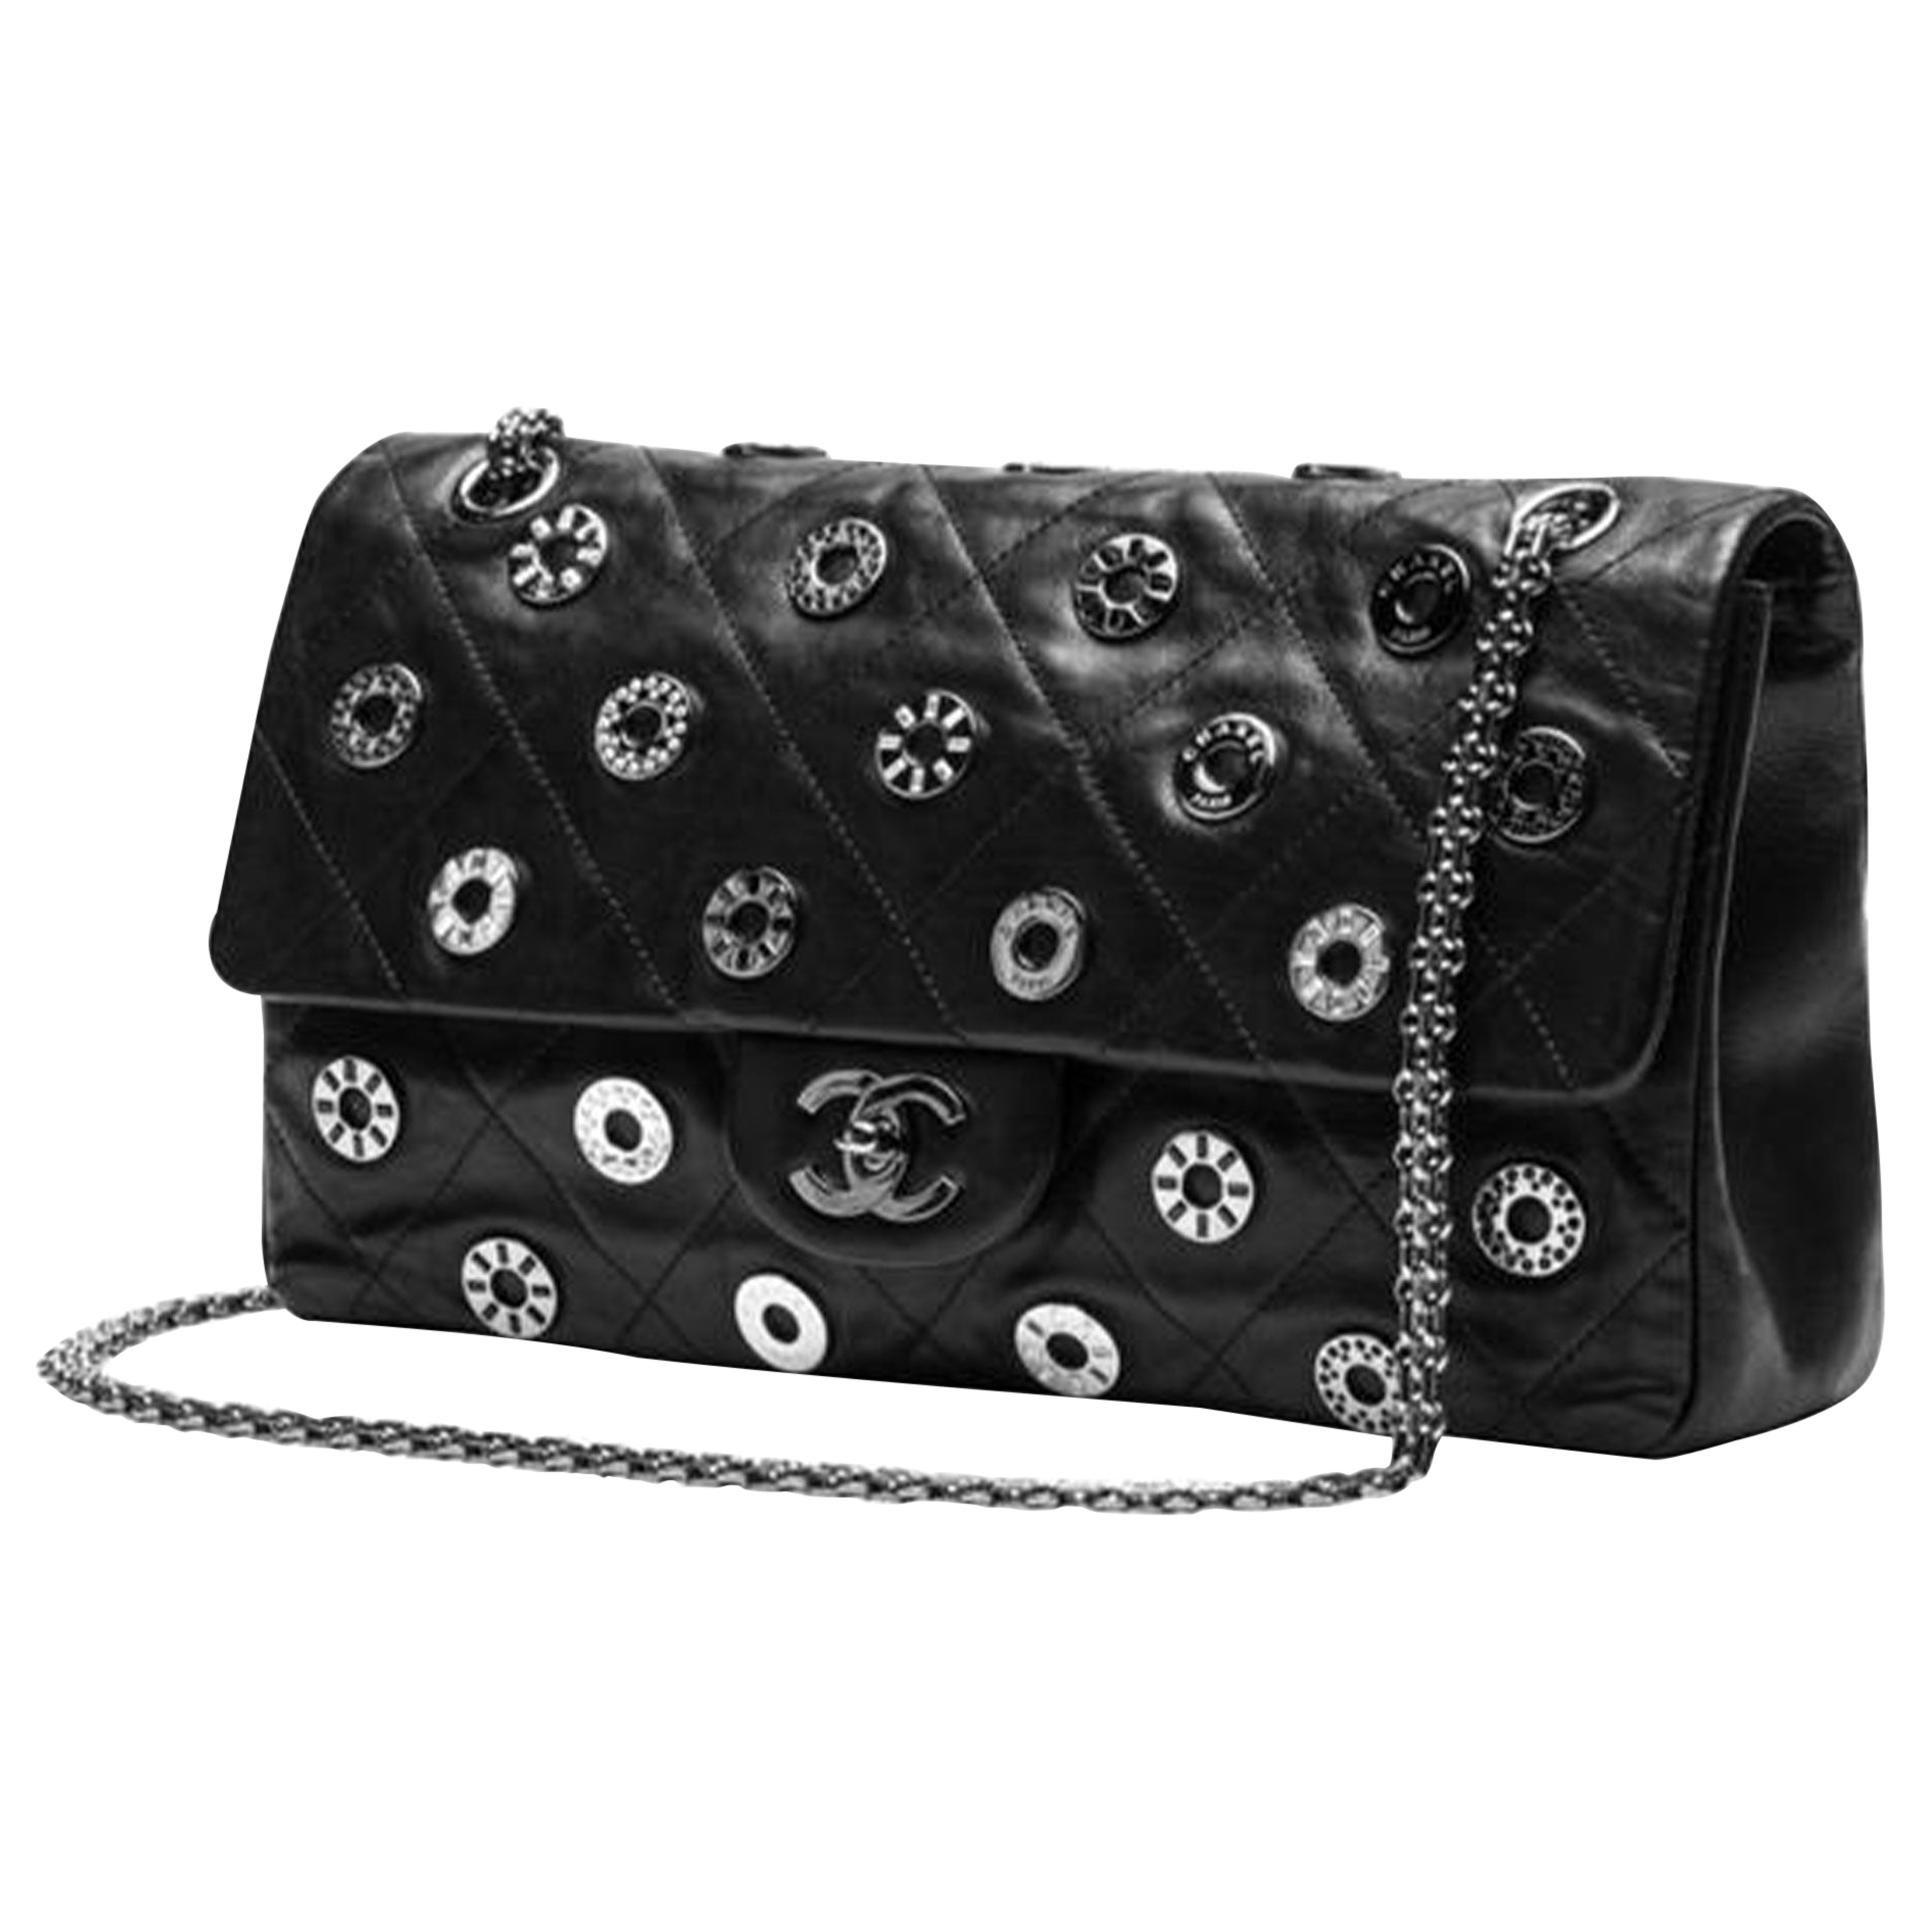 Chanel Classic Flap 2.55 Reissue Runway Rare Swarovski Lucky Charms Black Bag